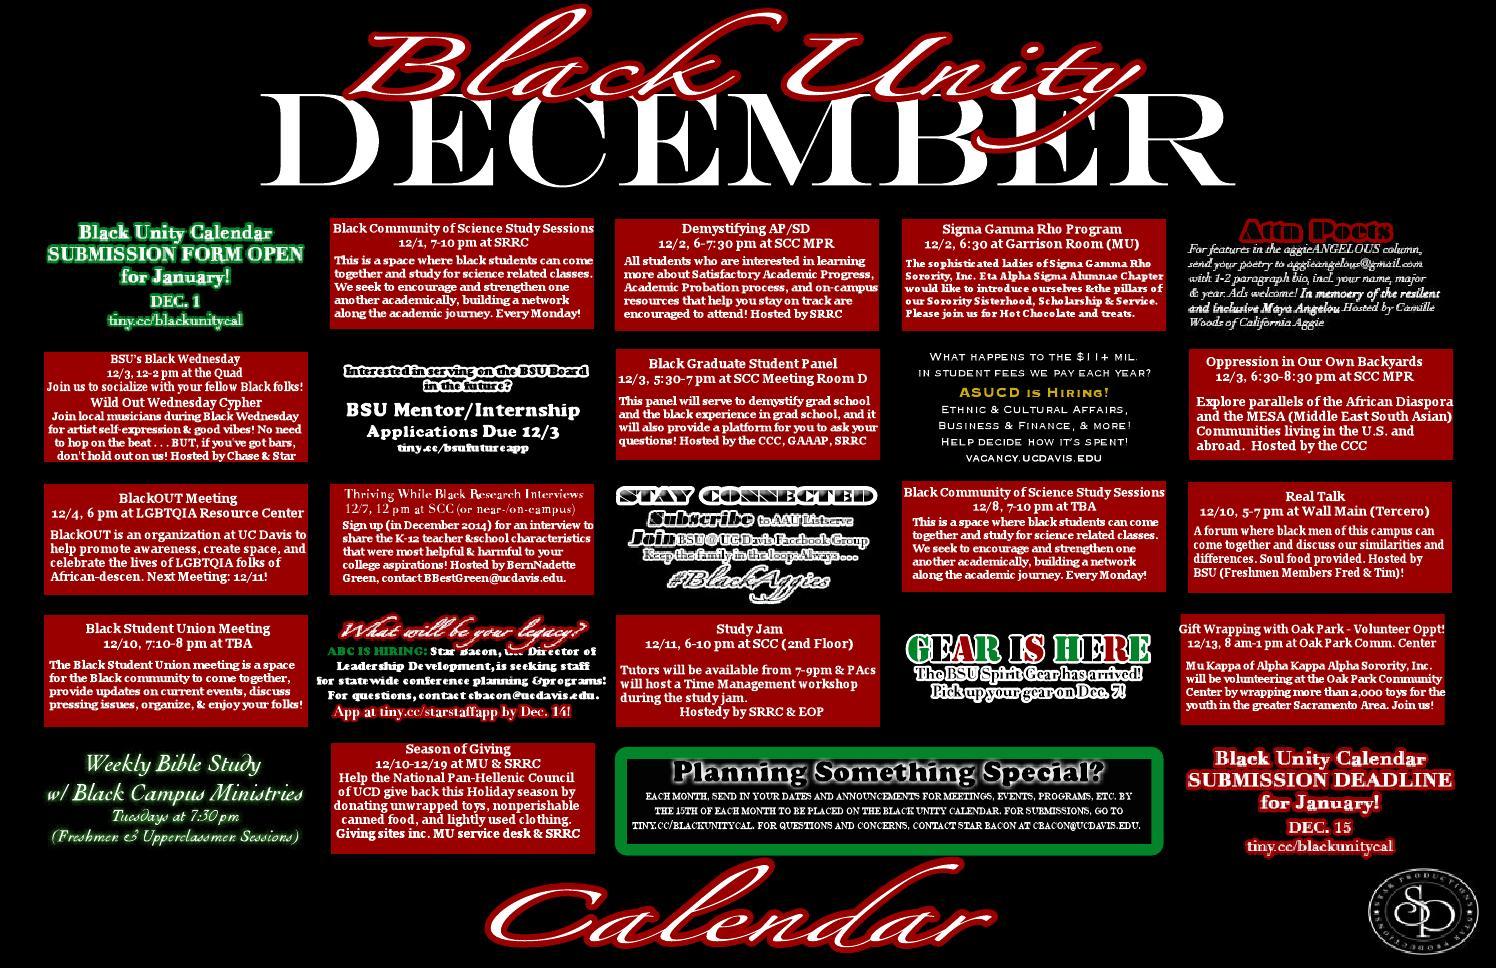 Uc Davis Academic Calendar.Black Unity Calendar By Star Bacon Issuu